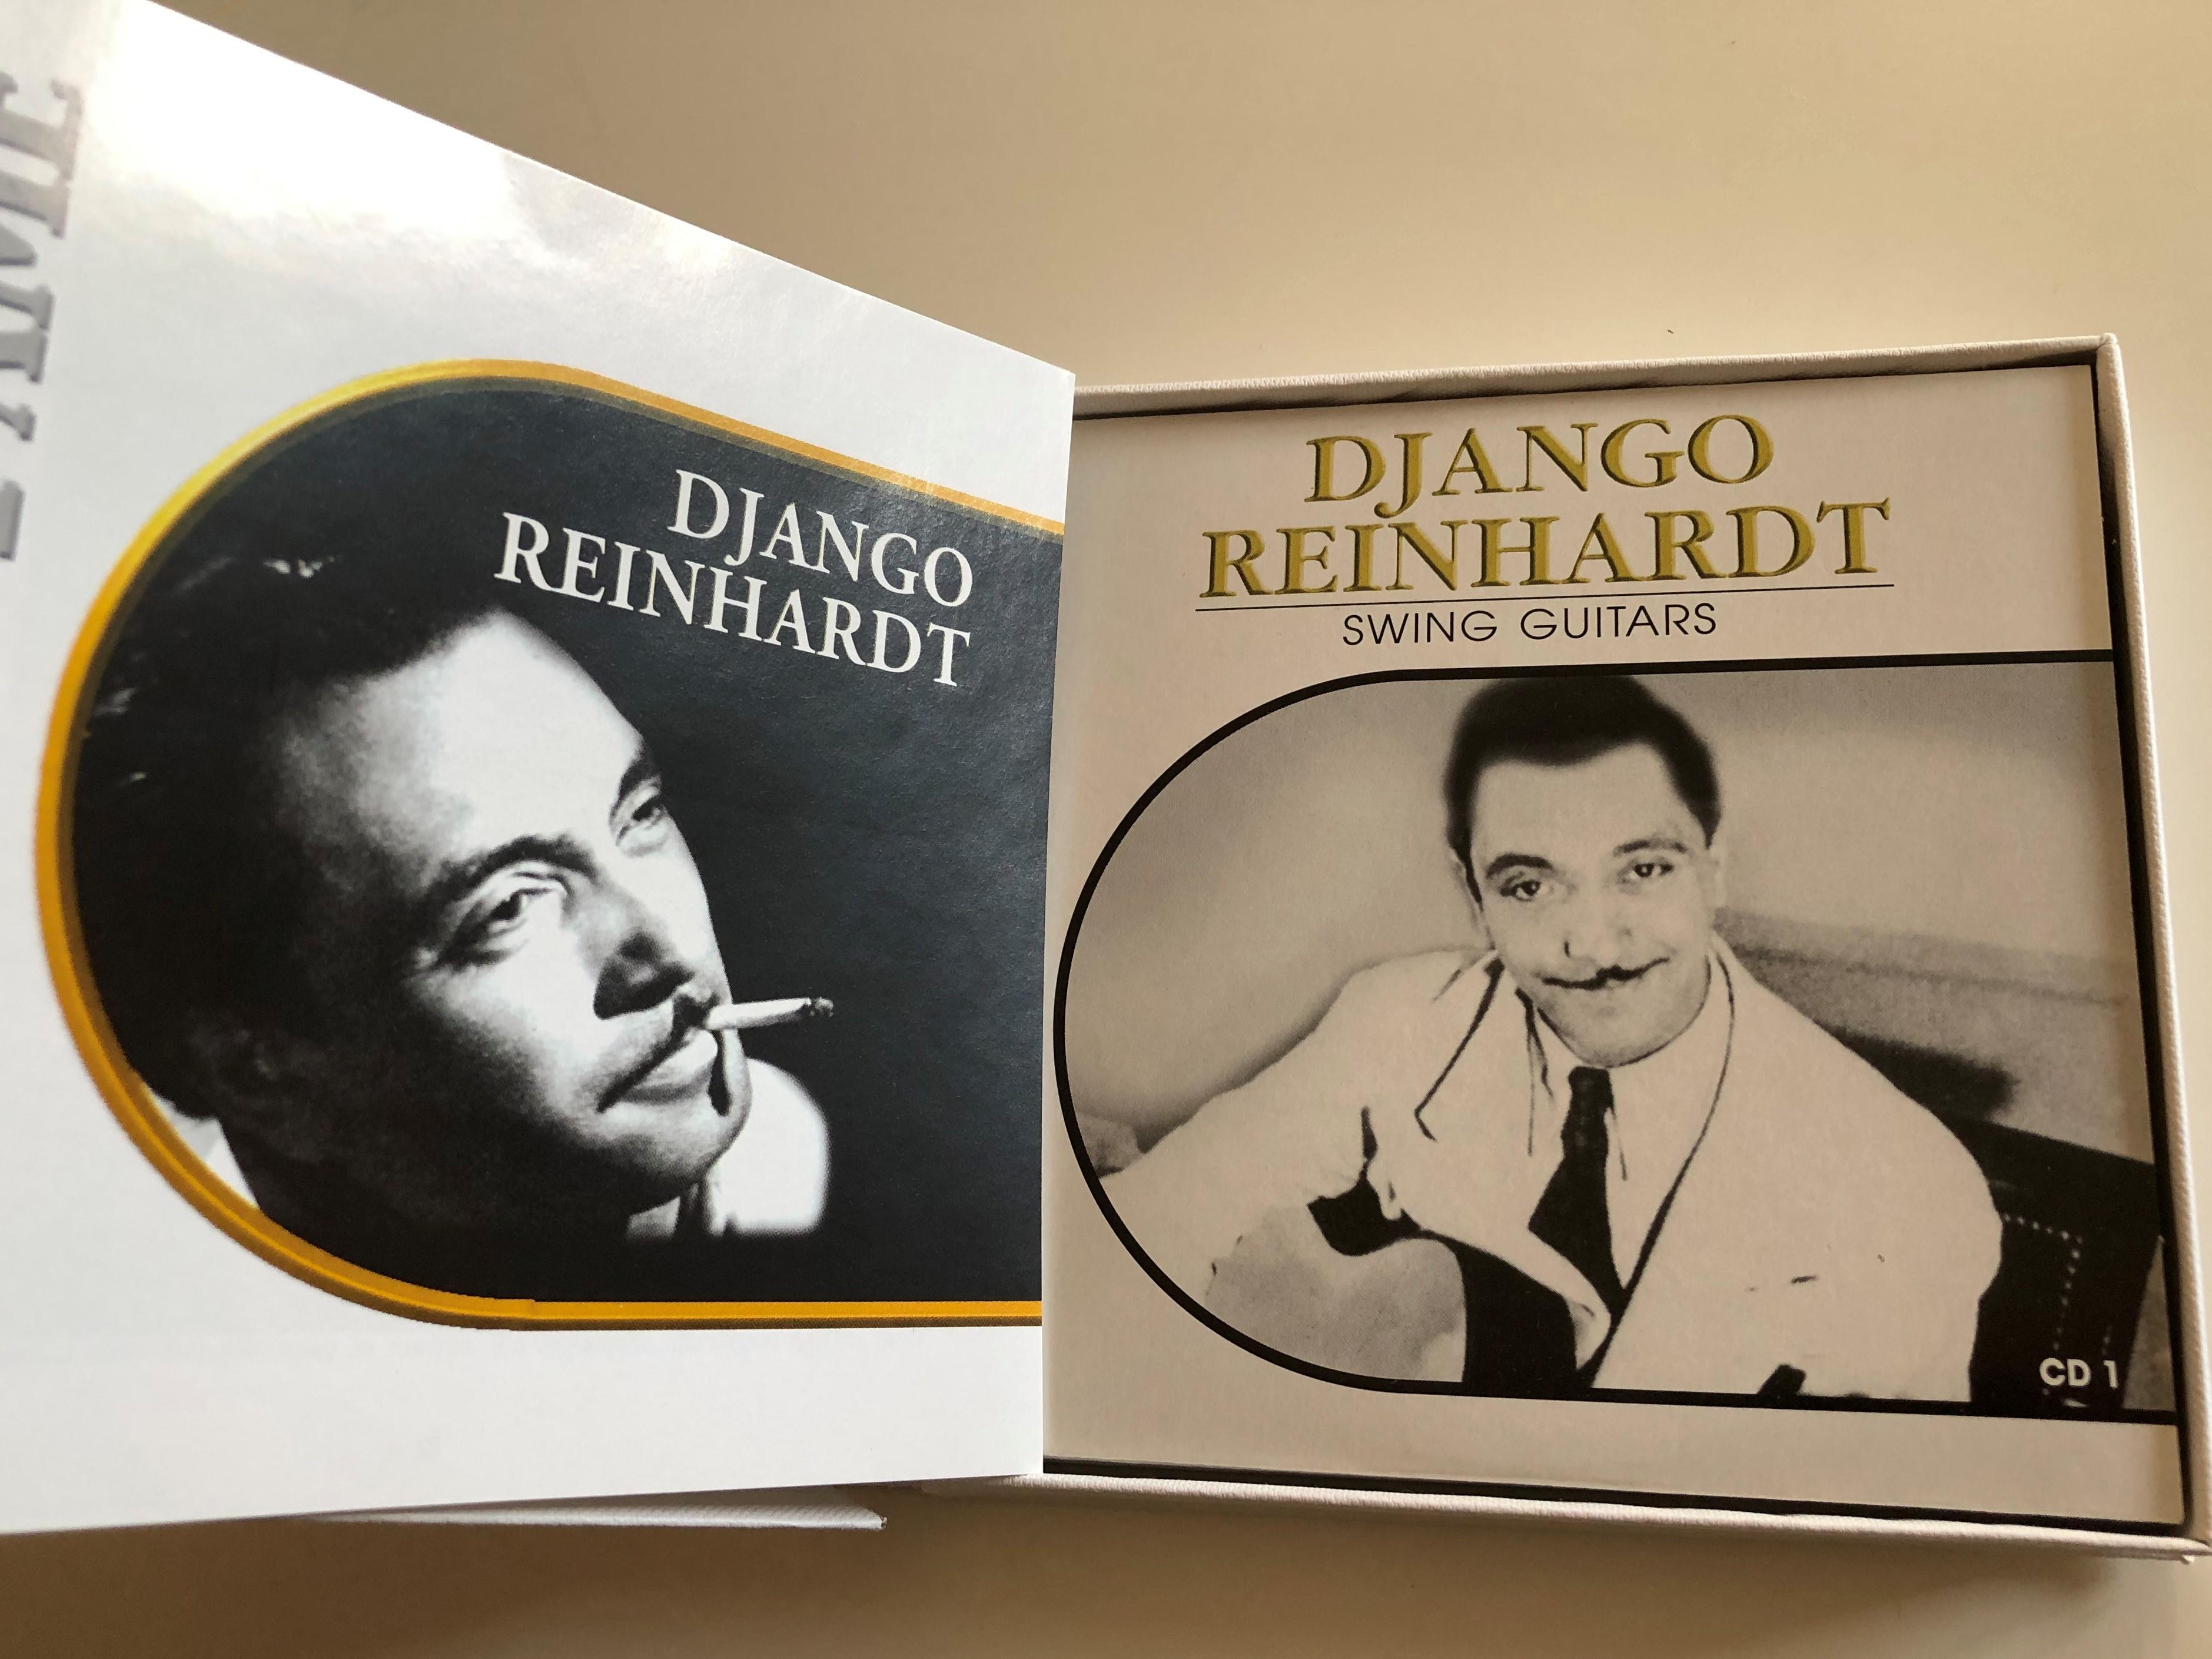 django-reinhardt-hall-of-fame-past-perfect-jazz-line-5x-audio-cd-2002-220167-2-.jpg